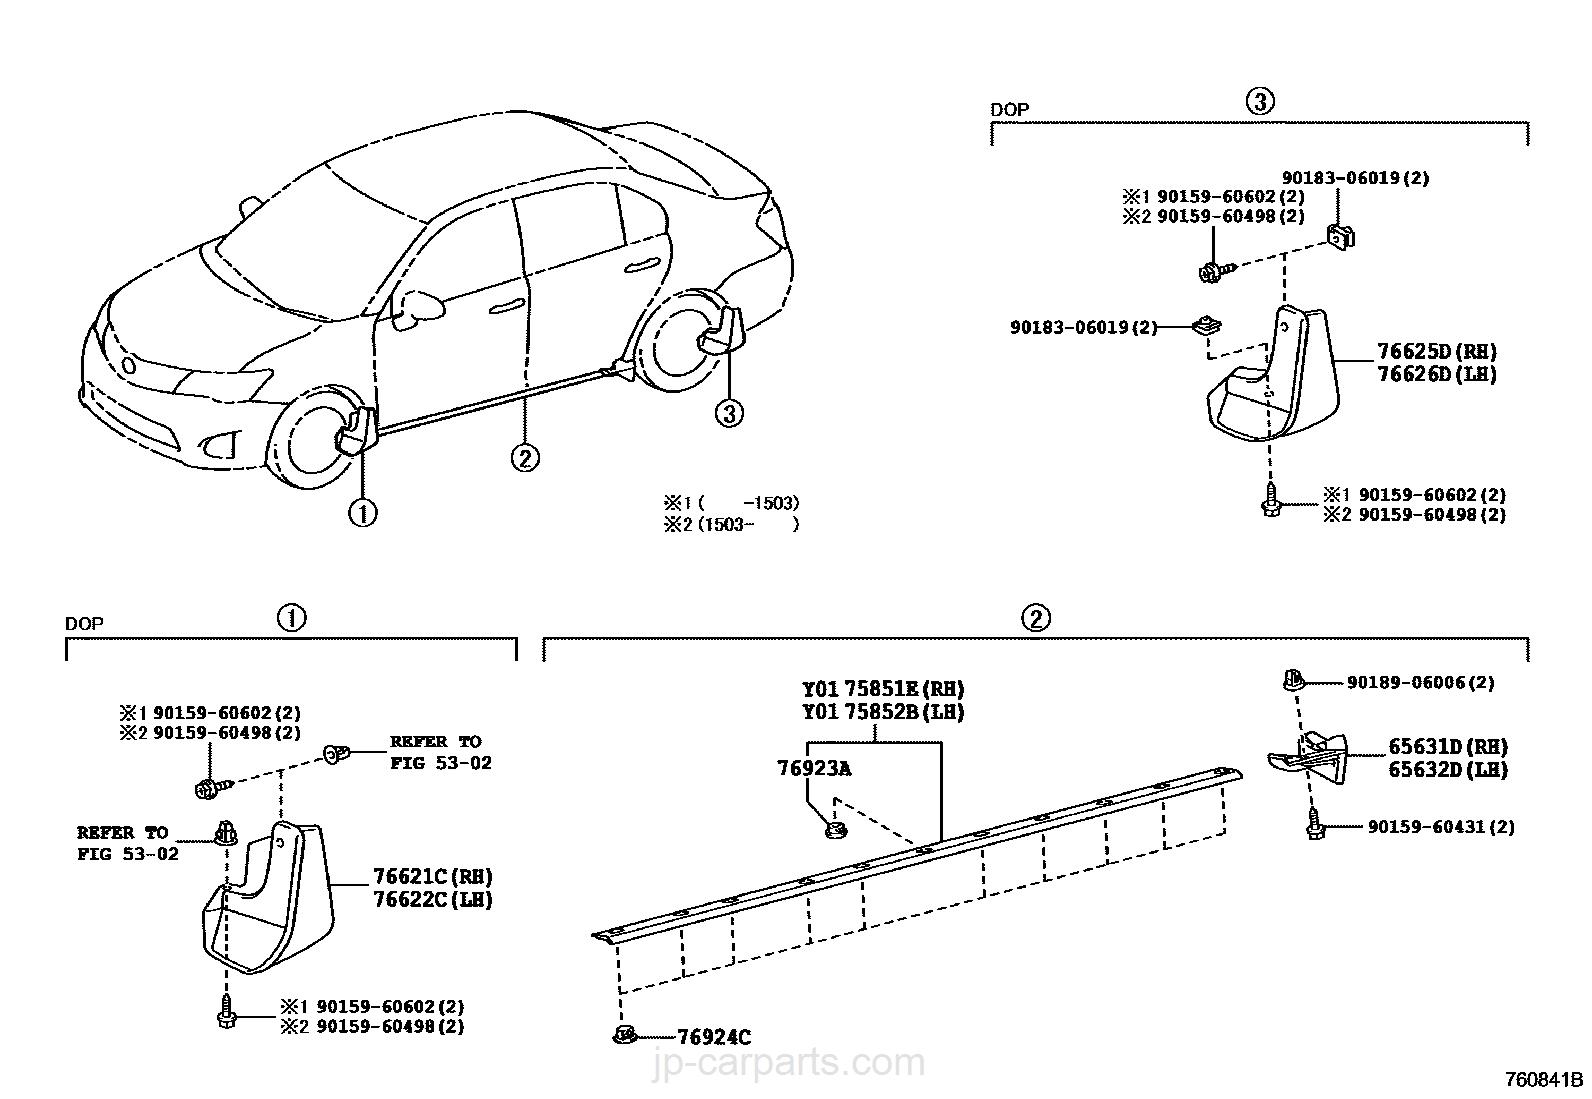 Mazda 3 Service Manual: Plug Hole Plate RemovalInstallation Mzr 2.0, Mzr 2.5